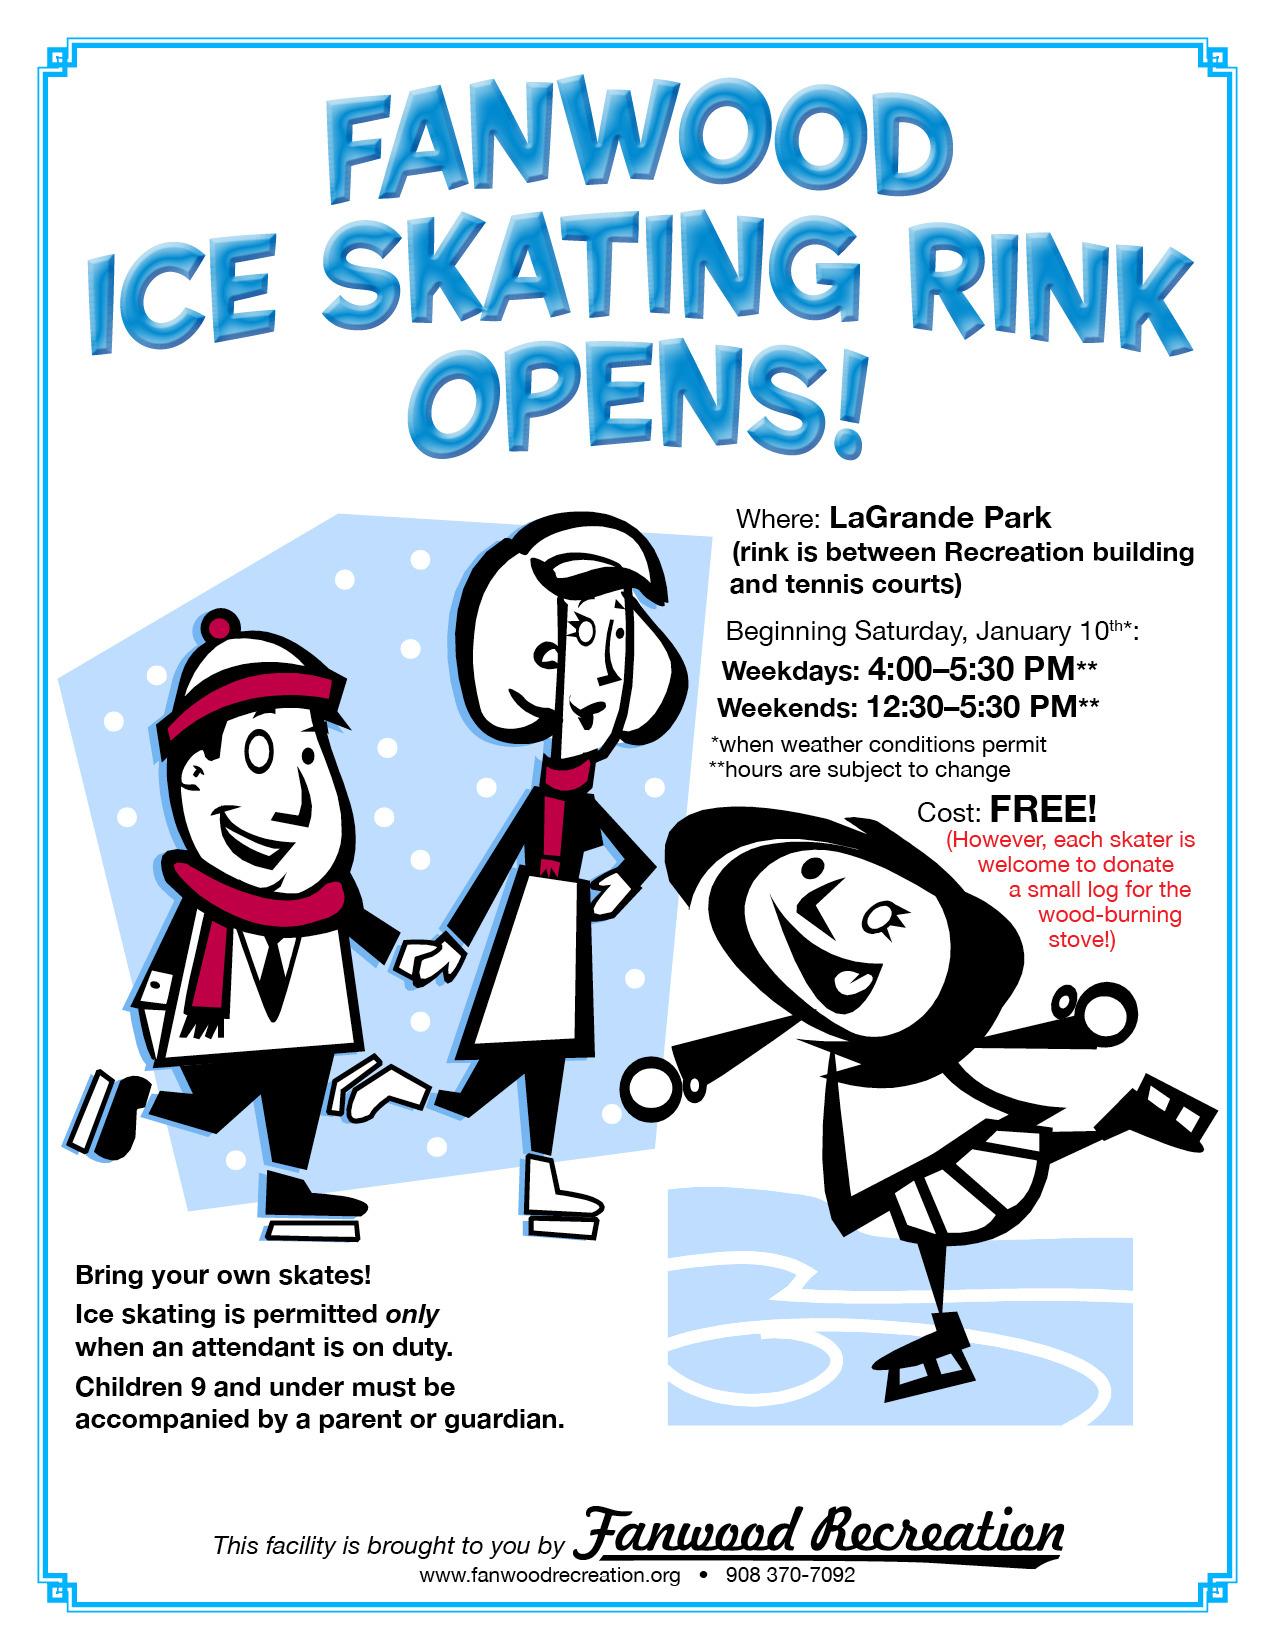 1b70a2a33e06361028ea_Fanwood_Ice_Skating_Rink_2015.jpg